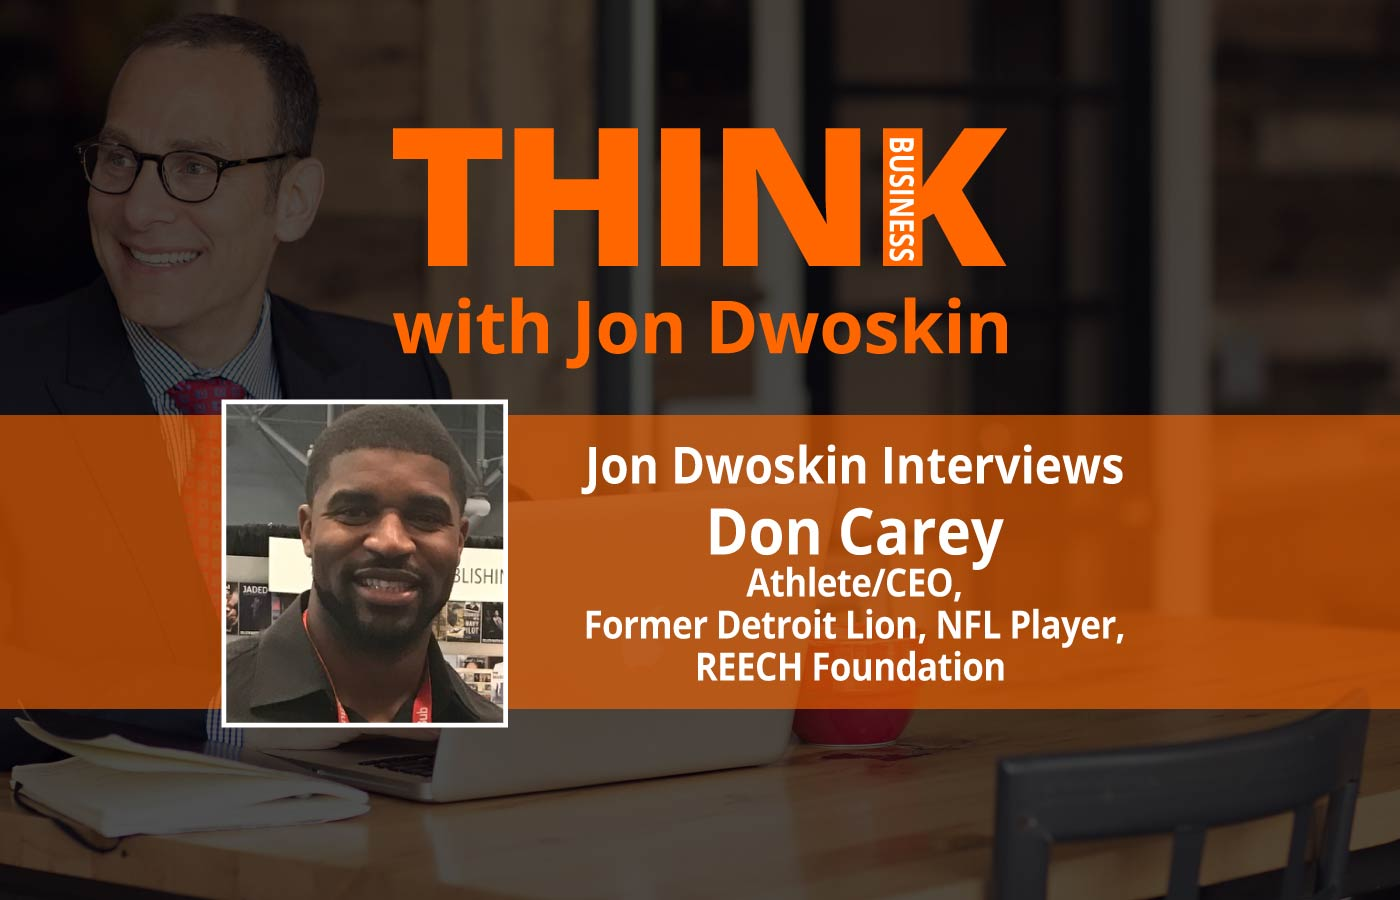 THINK Business: Jon Dwoskin Interviews Don Carey, Athlete/CEO, Detroit Lions & REECH Foundation